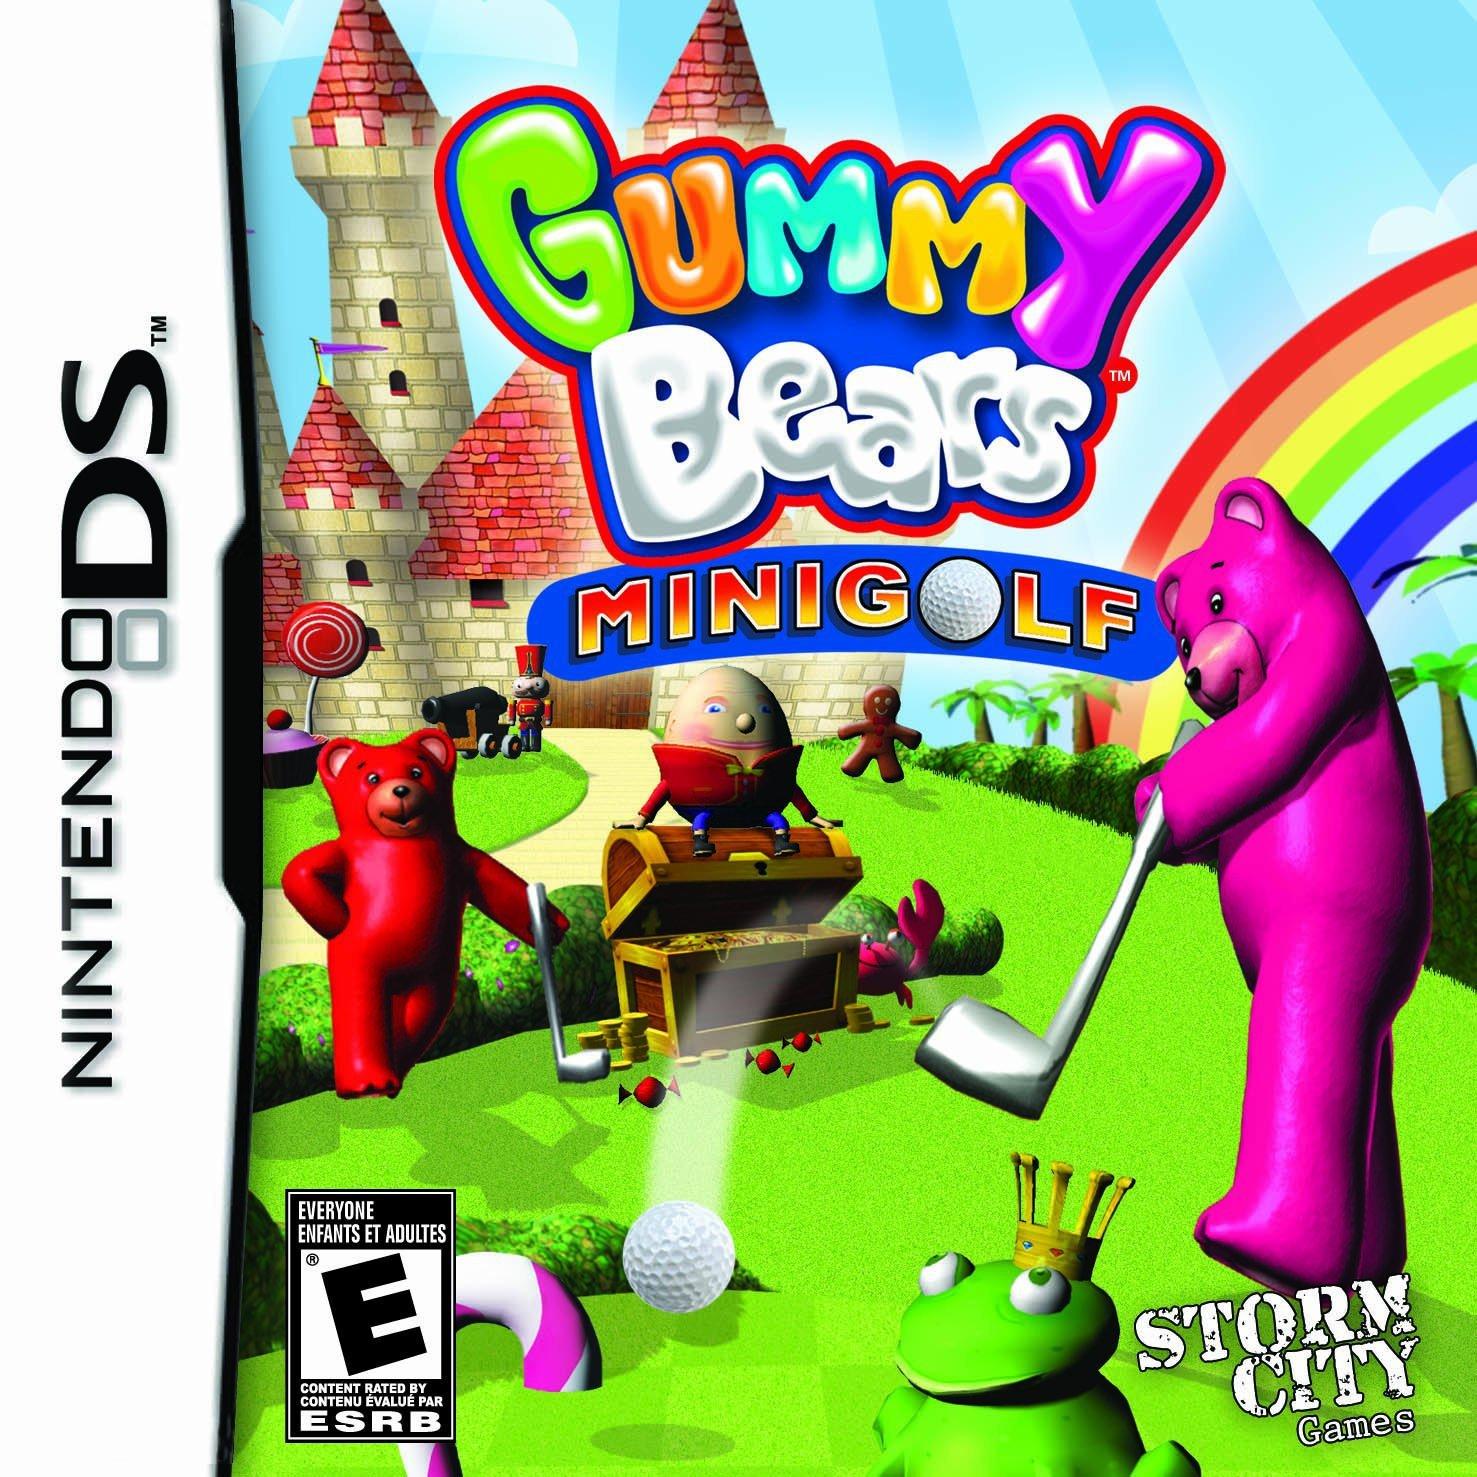 Gummy Bears Minigolf